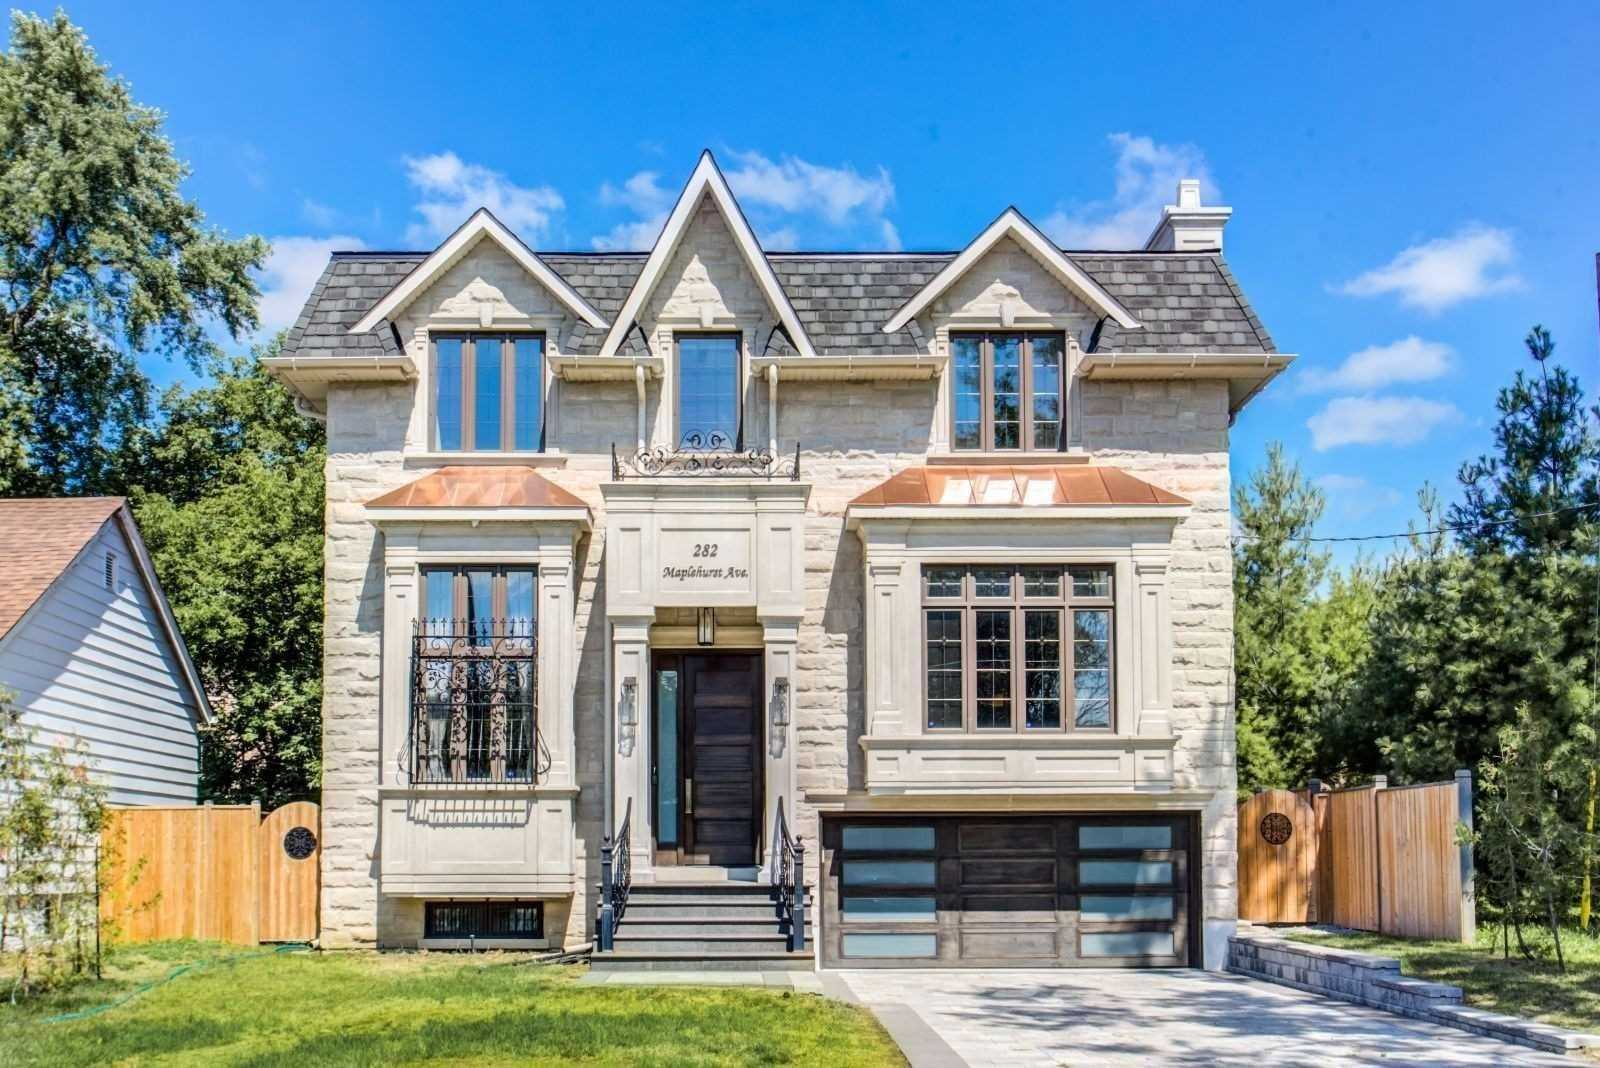 282 Maplehurst Ave, Toronto Ontario, Canada